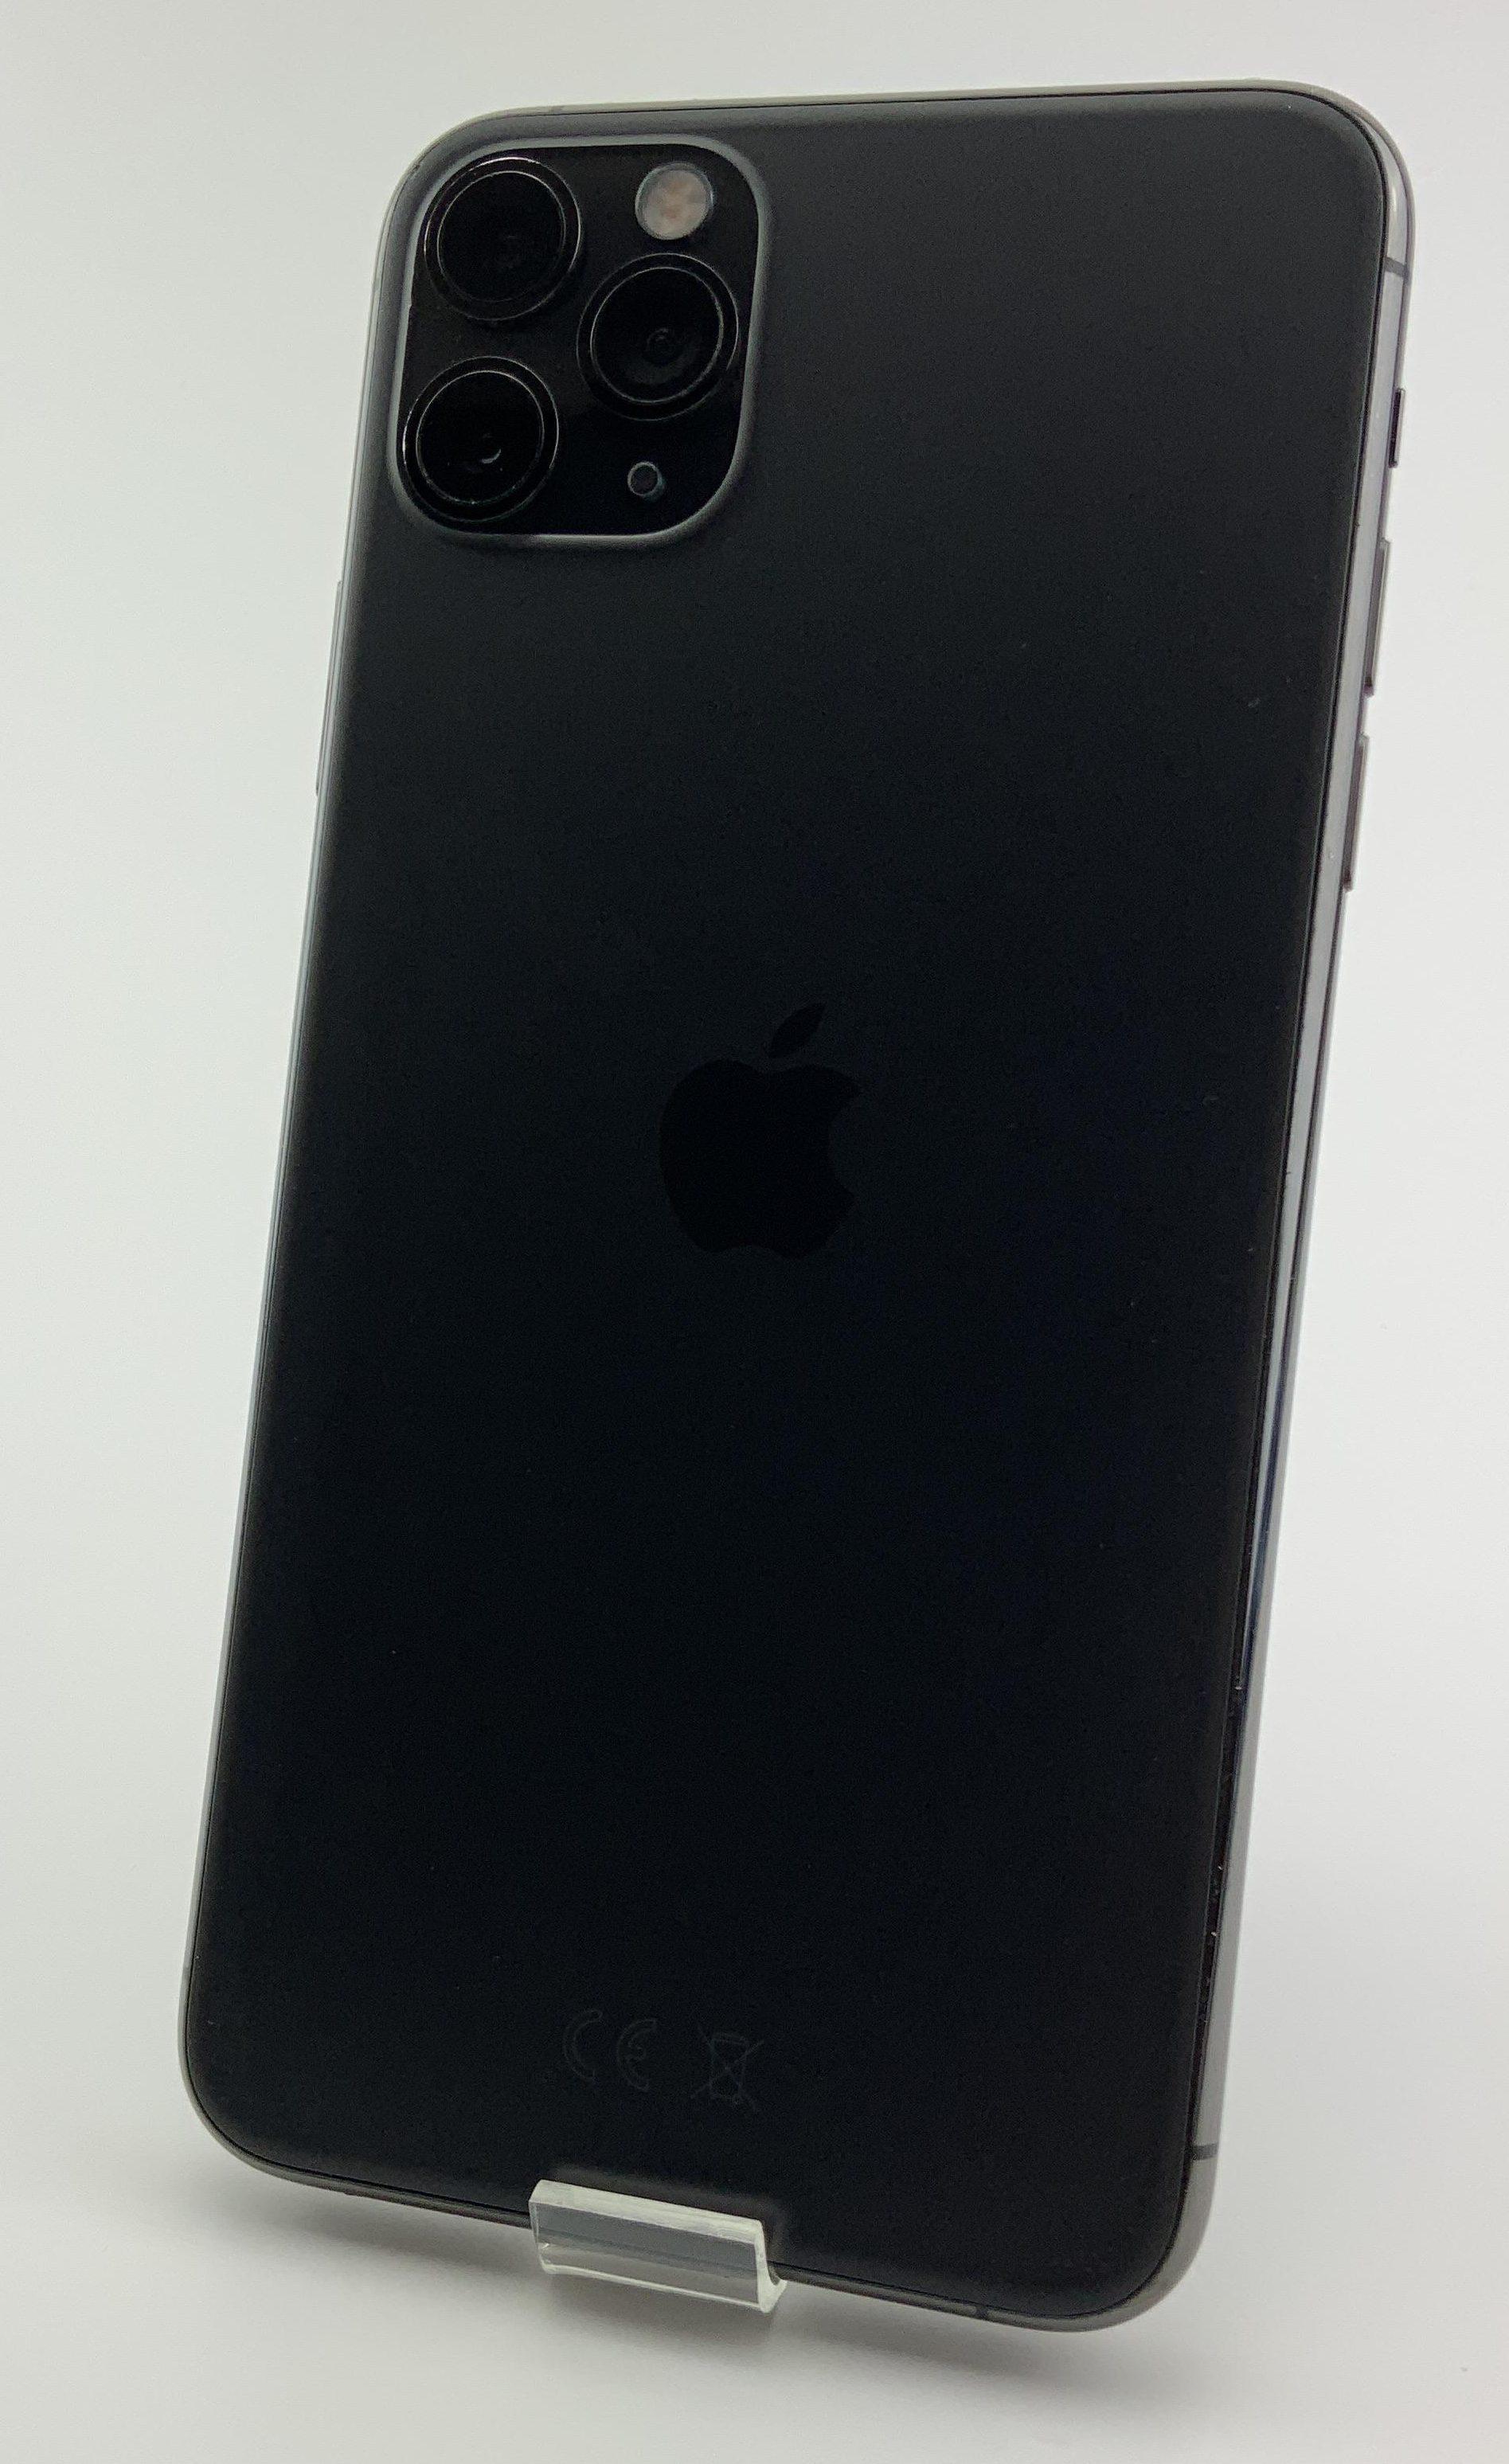 iPhone 11 Pro Max 64GB, 64GB, Space Gray, Kuva 1